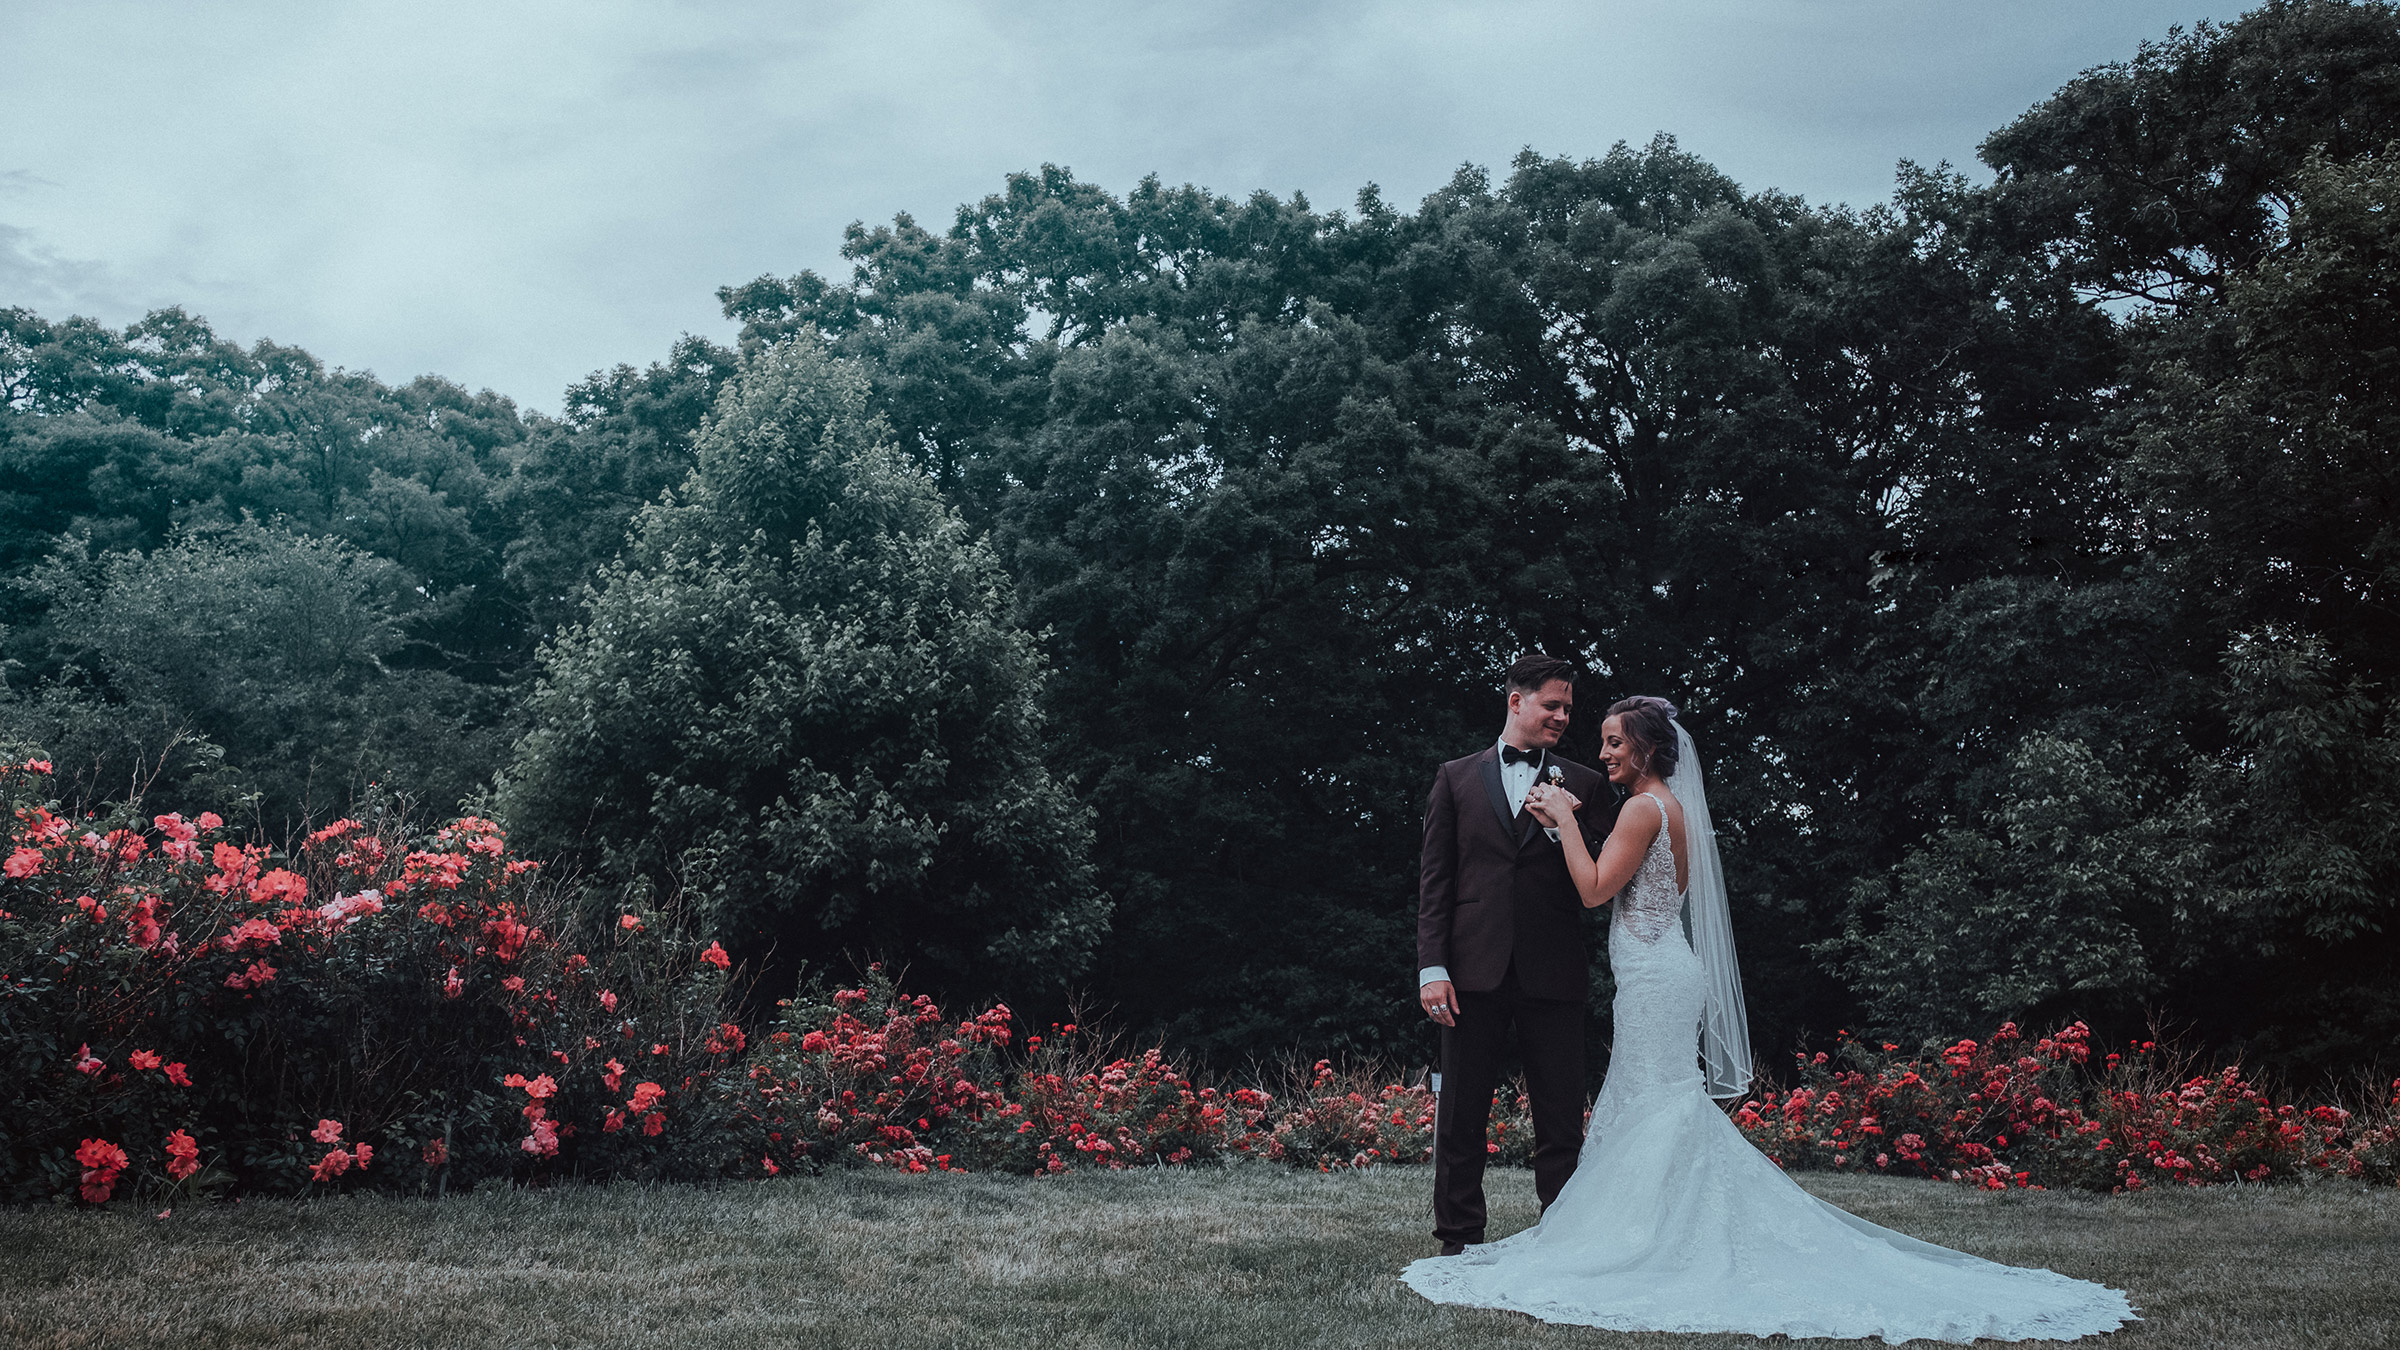 bride-groom-standing-in-rose-garden-holding-hands-desmoines-iowa-art-center-raelyn-ramey-photography.jpg